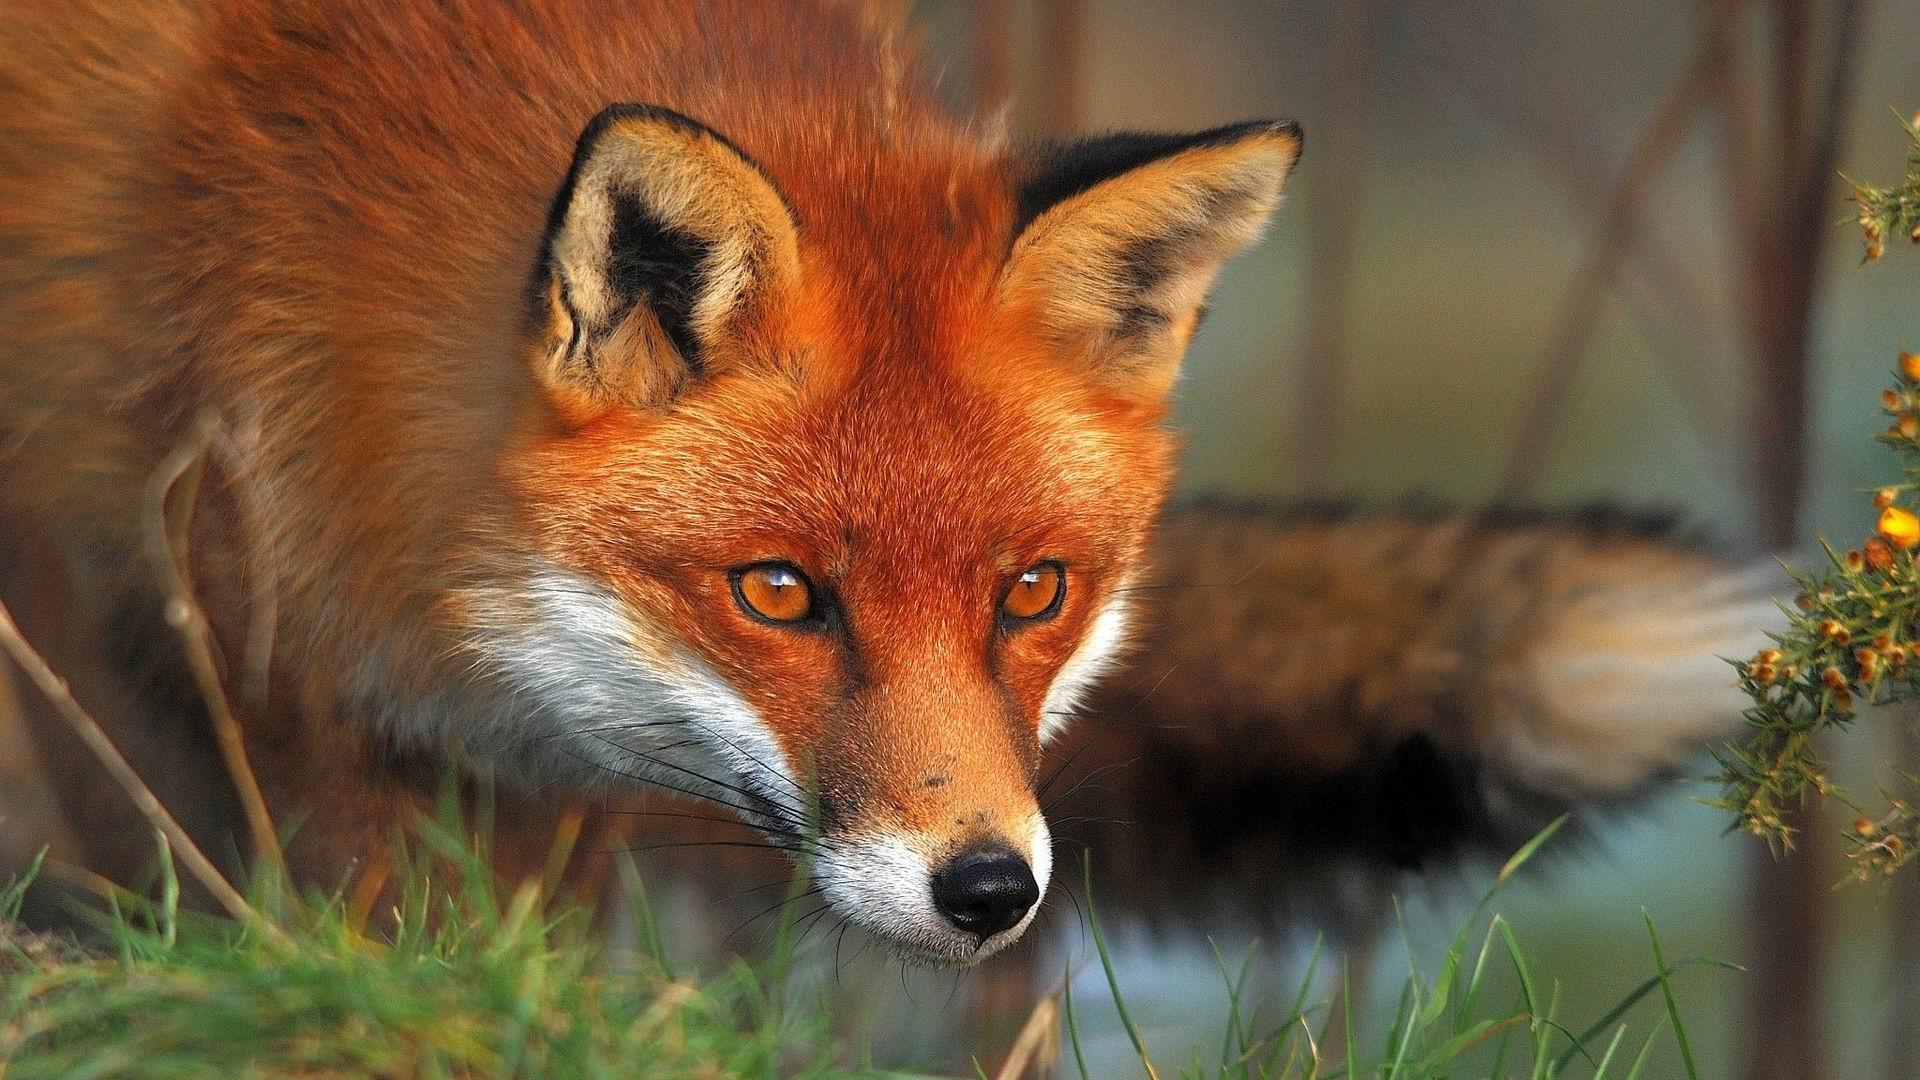 Fox HD Animal wallpaper HD Wallpaper Background Photo Picture 1920x1080